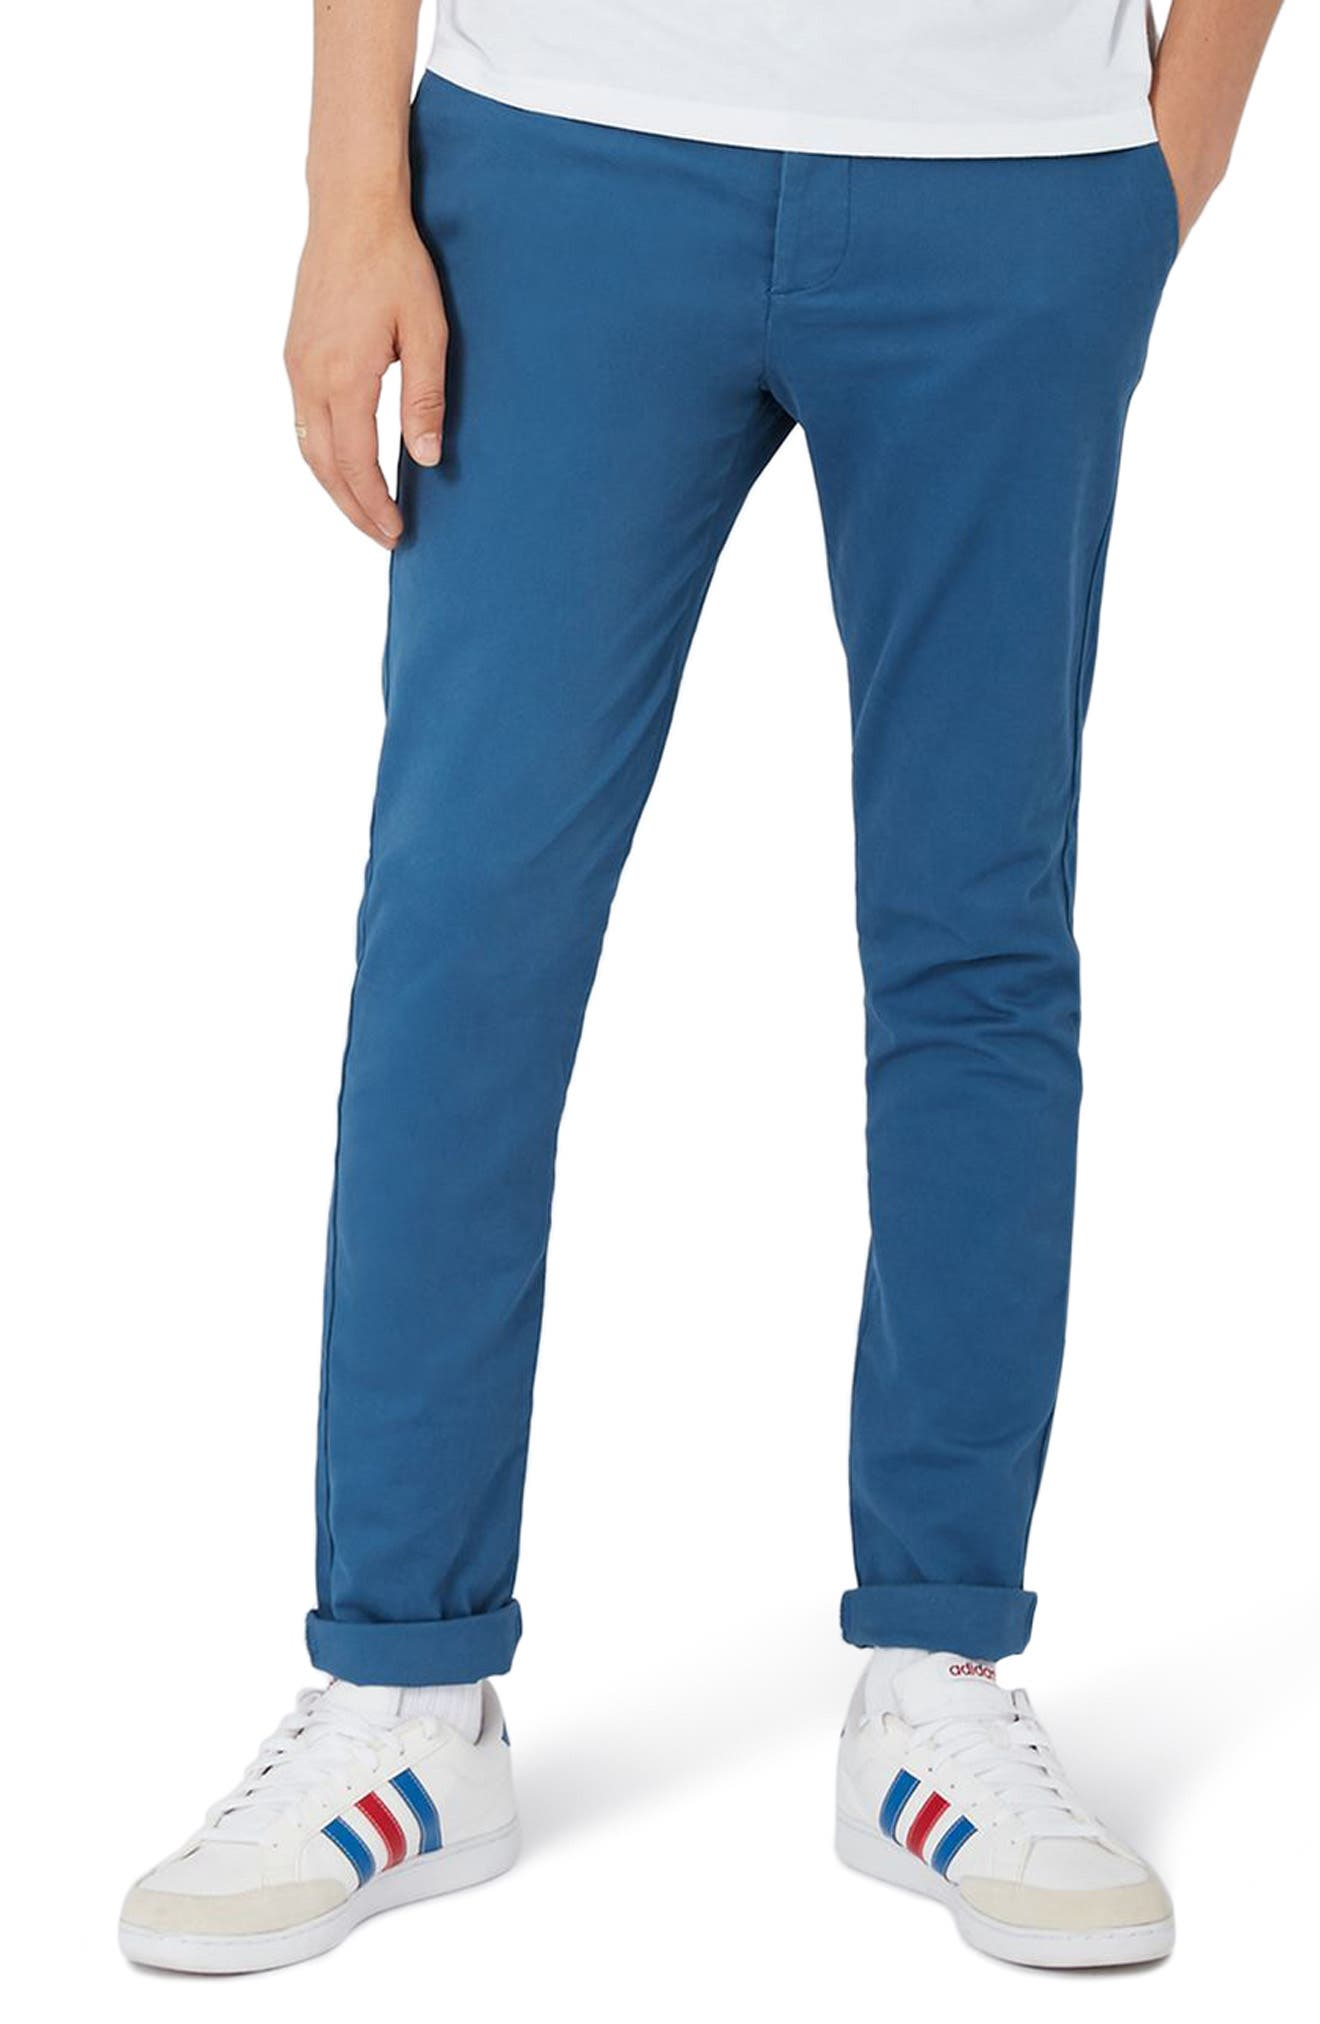 Skinny Fit Chinos,                         Main,                         color, Medium Blue